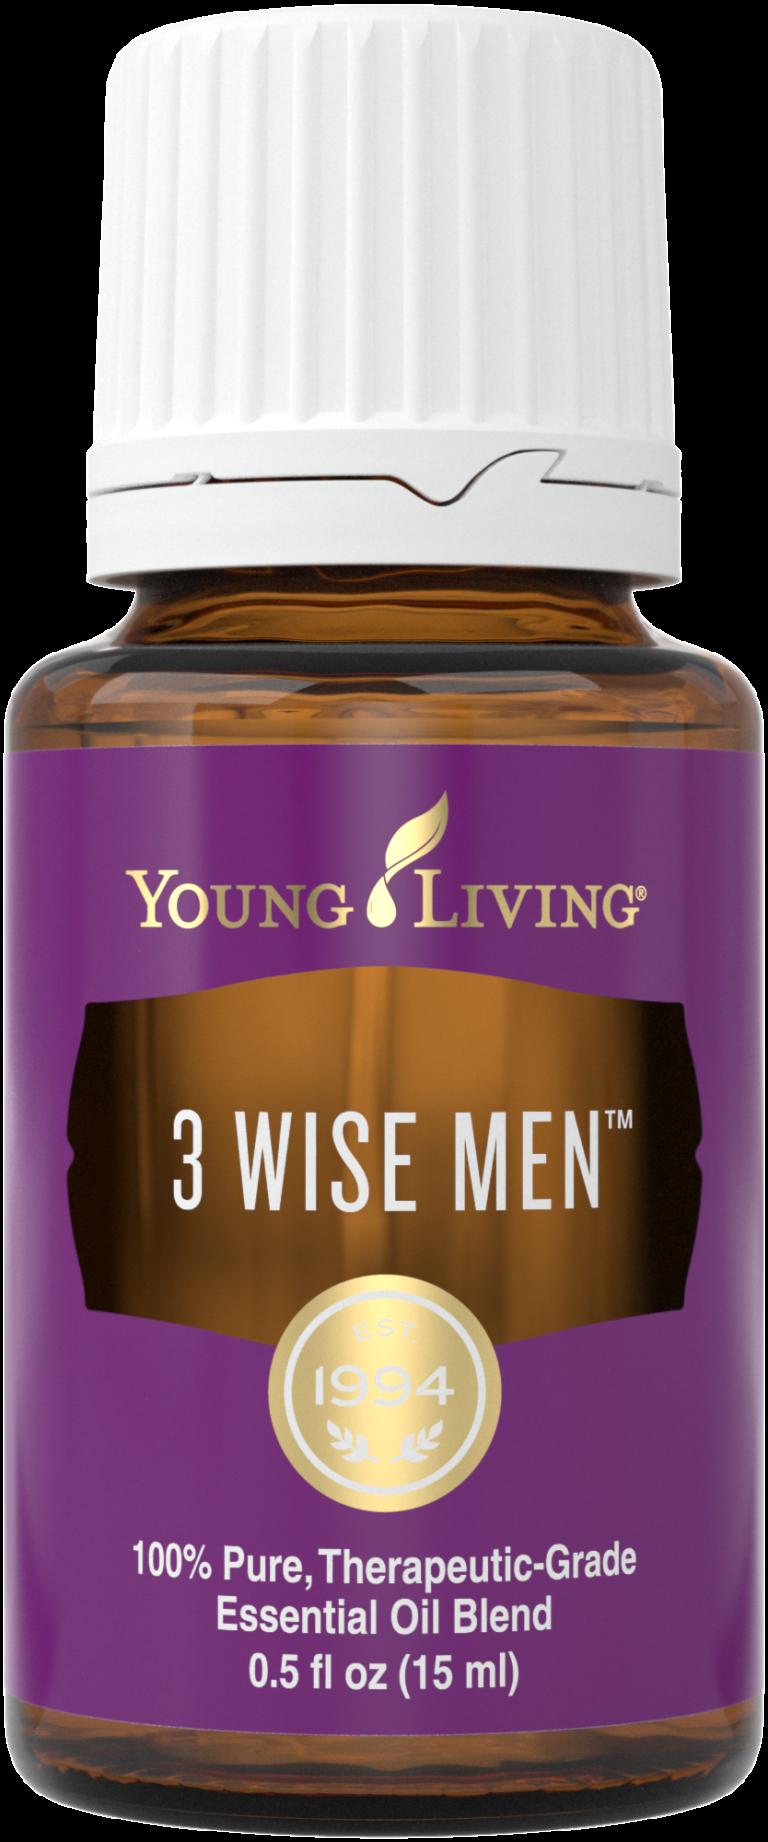 3wisemen